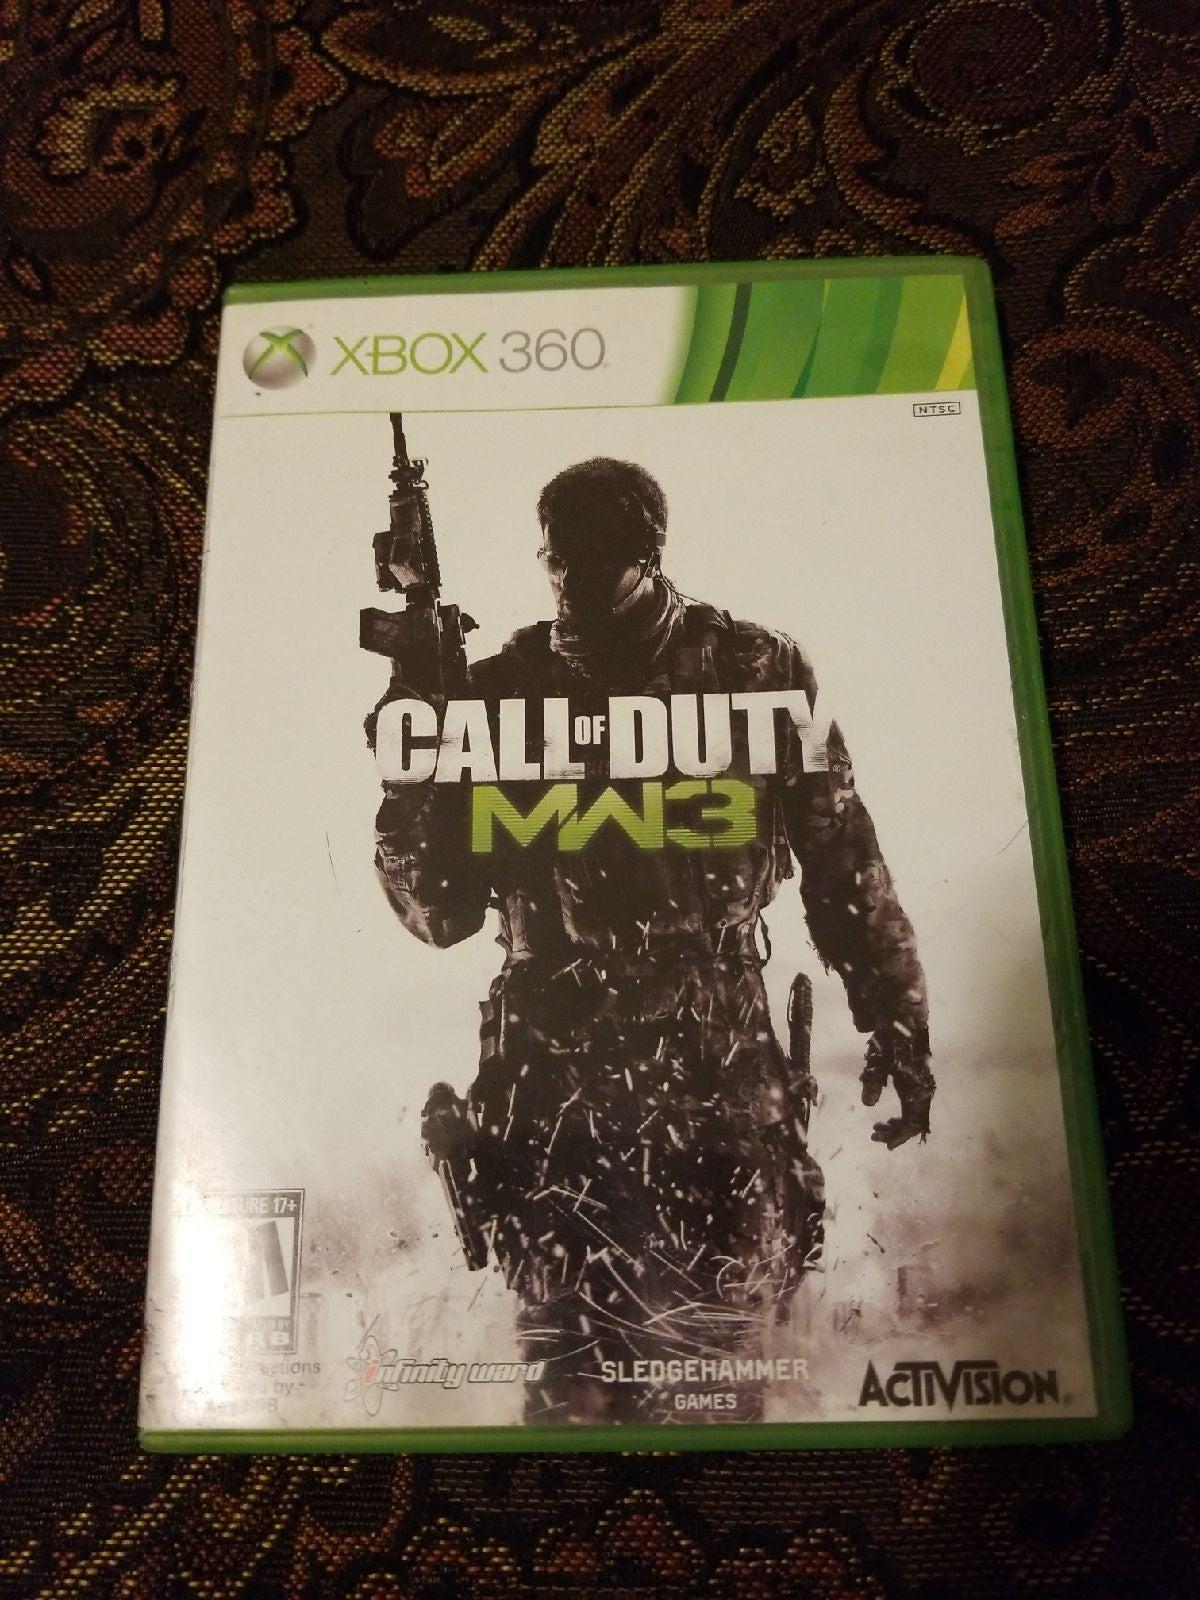 Call of Duty Modern Warfare 3 / XBOX 360